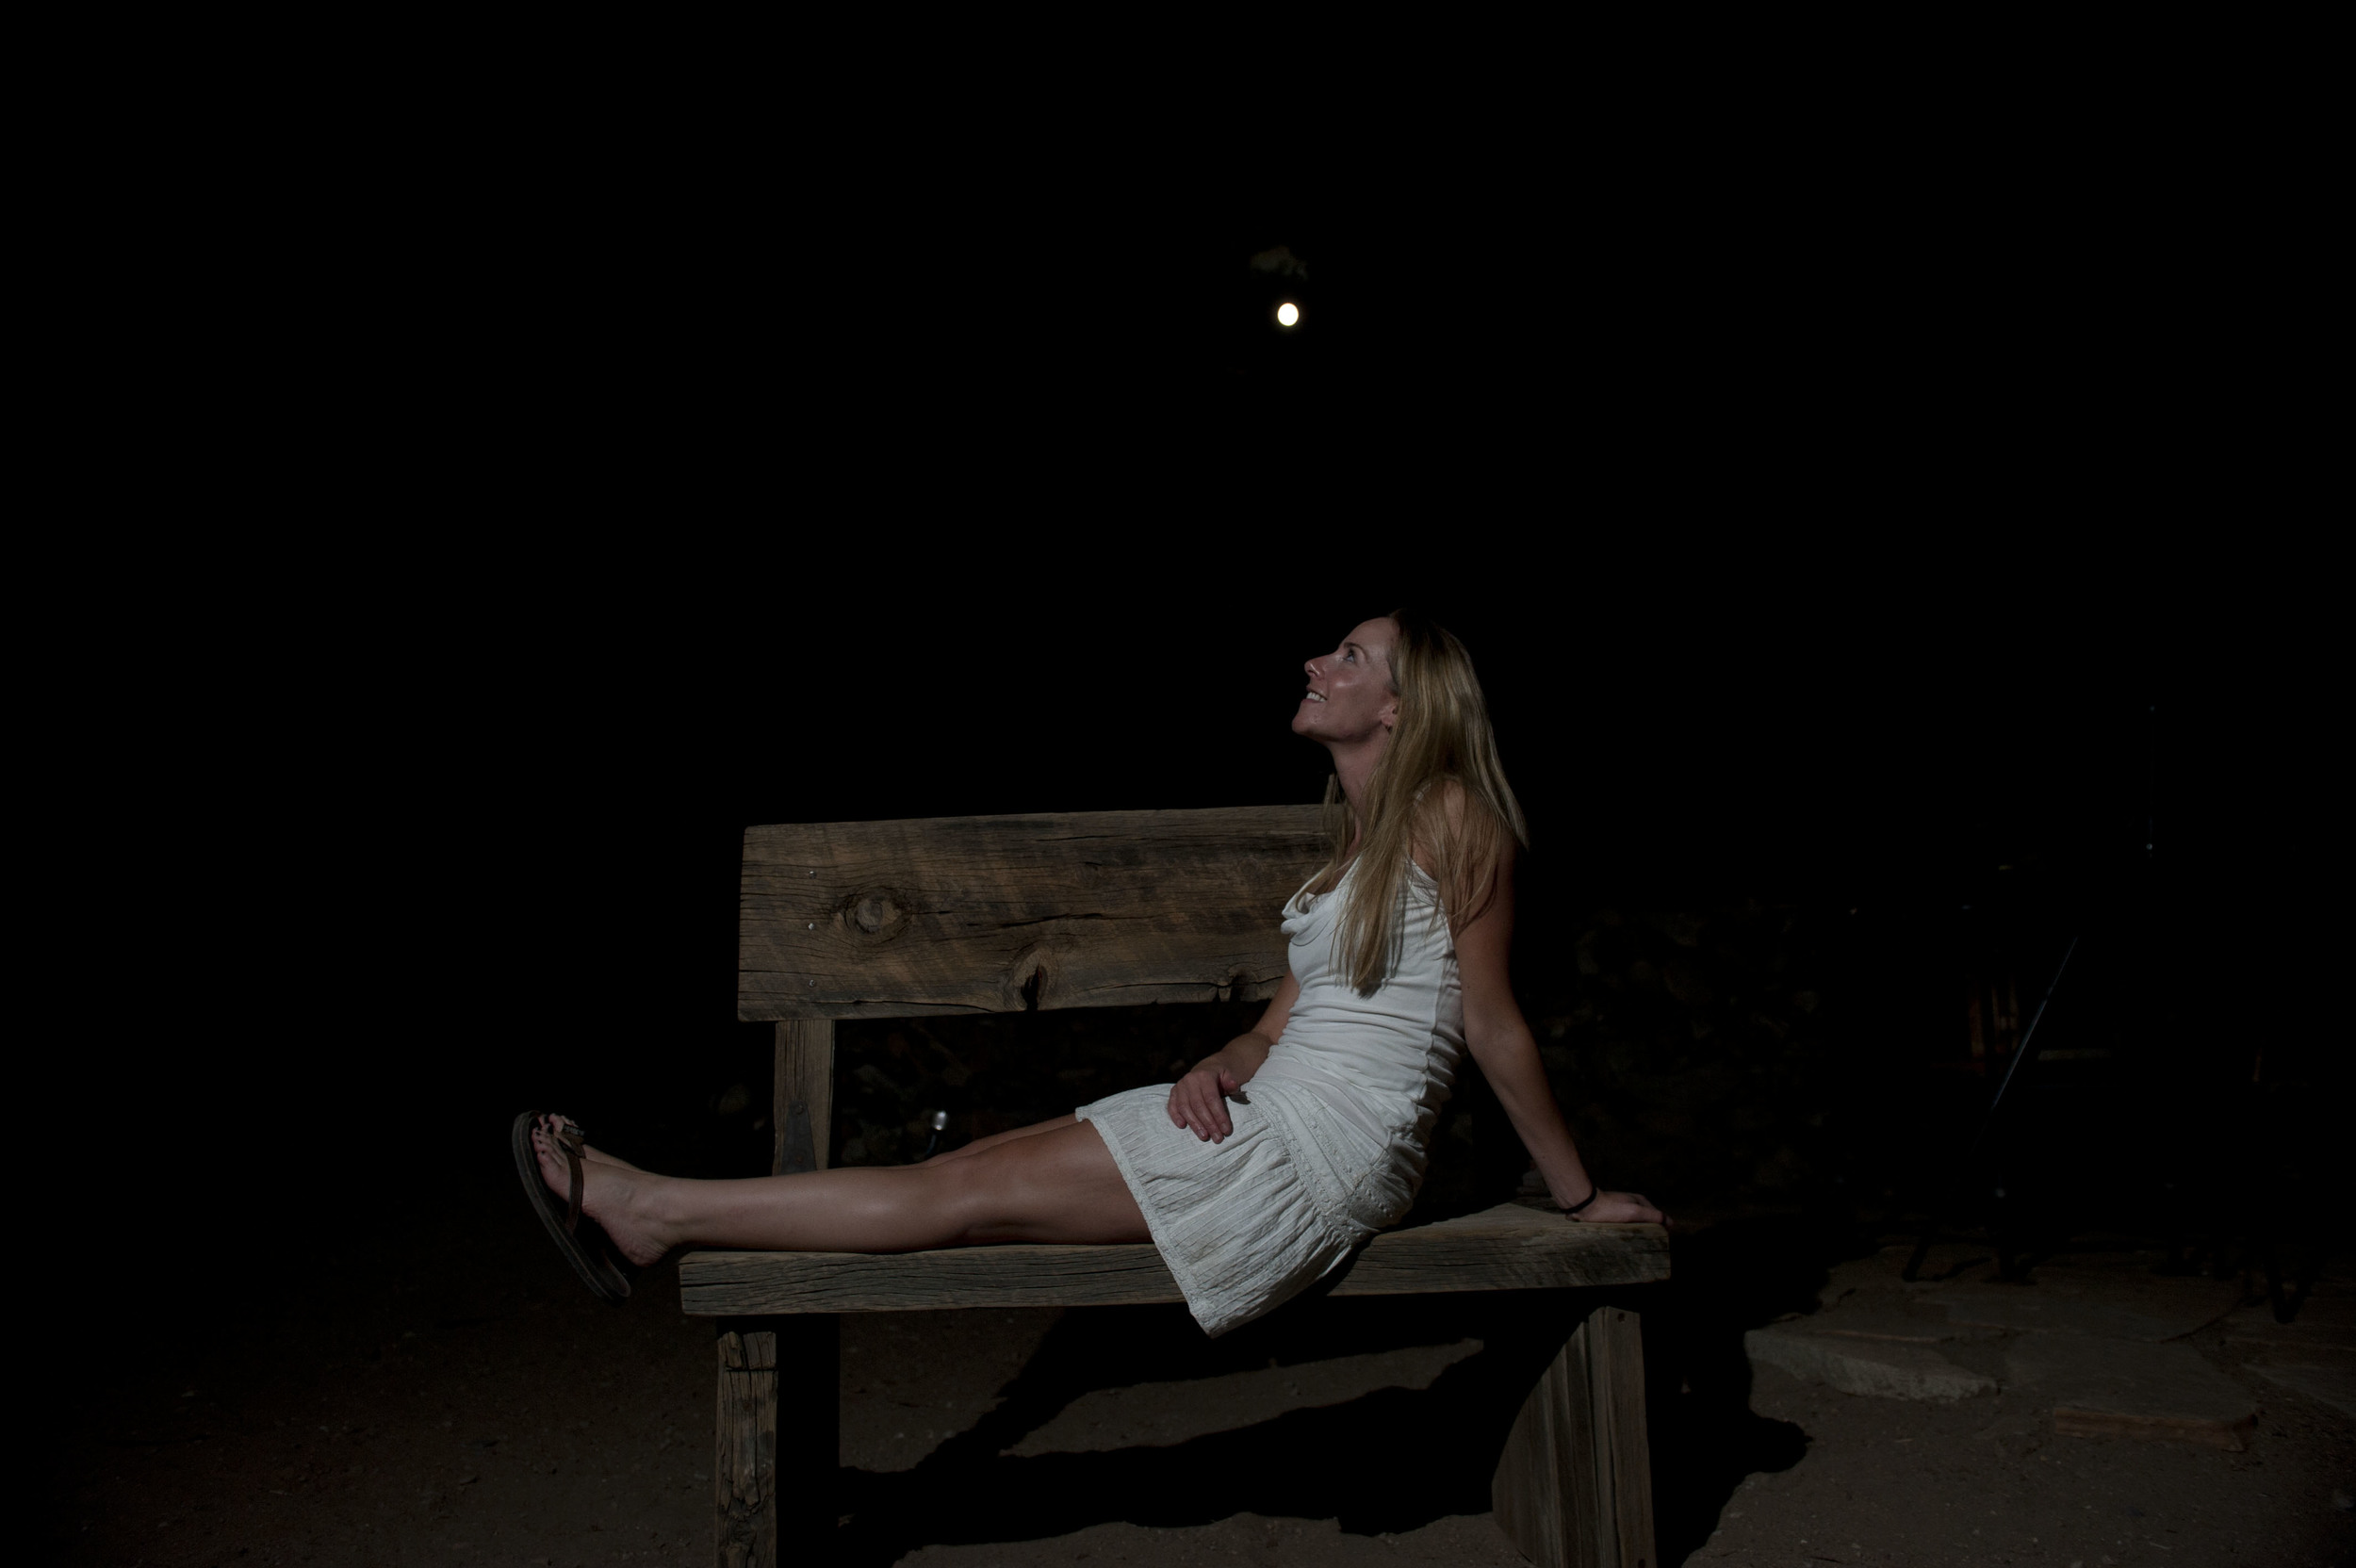 Moon Goddess Bench